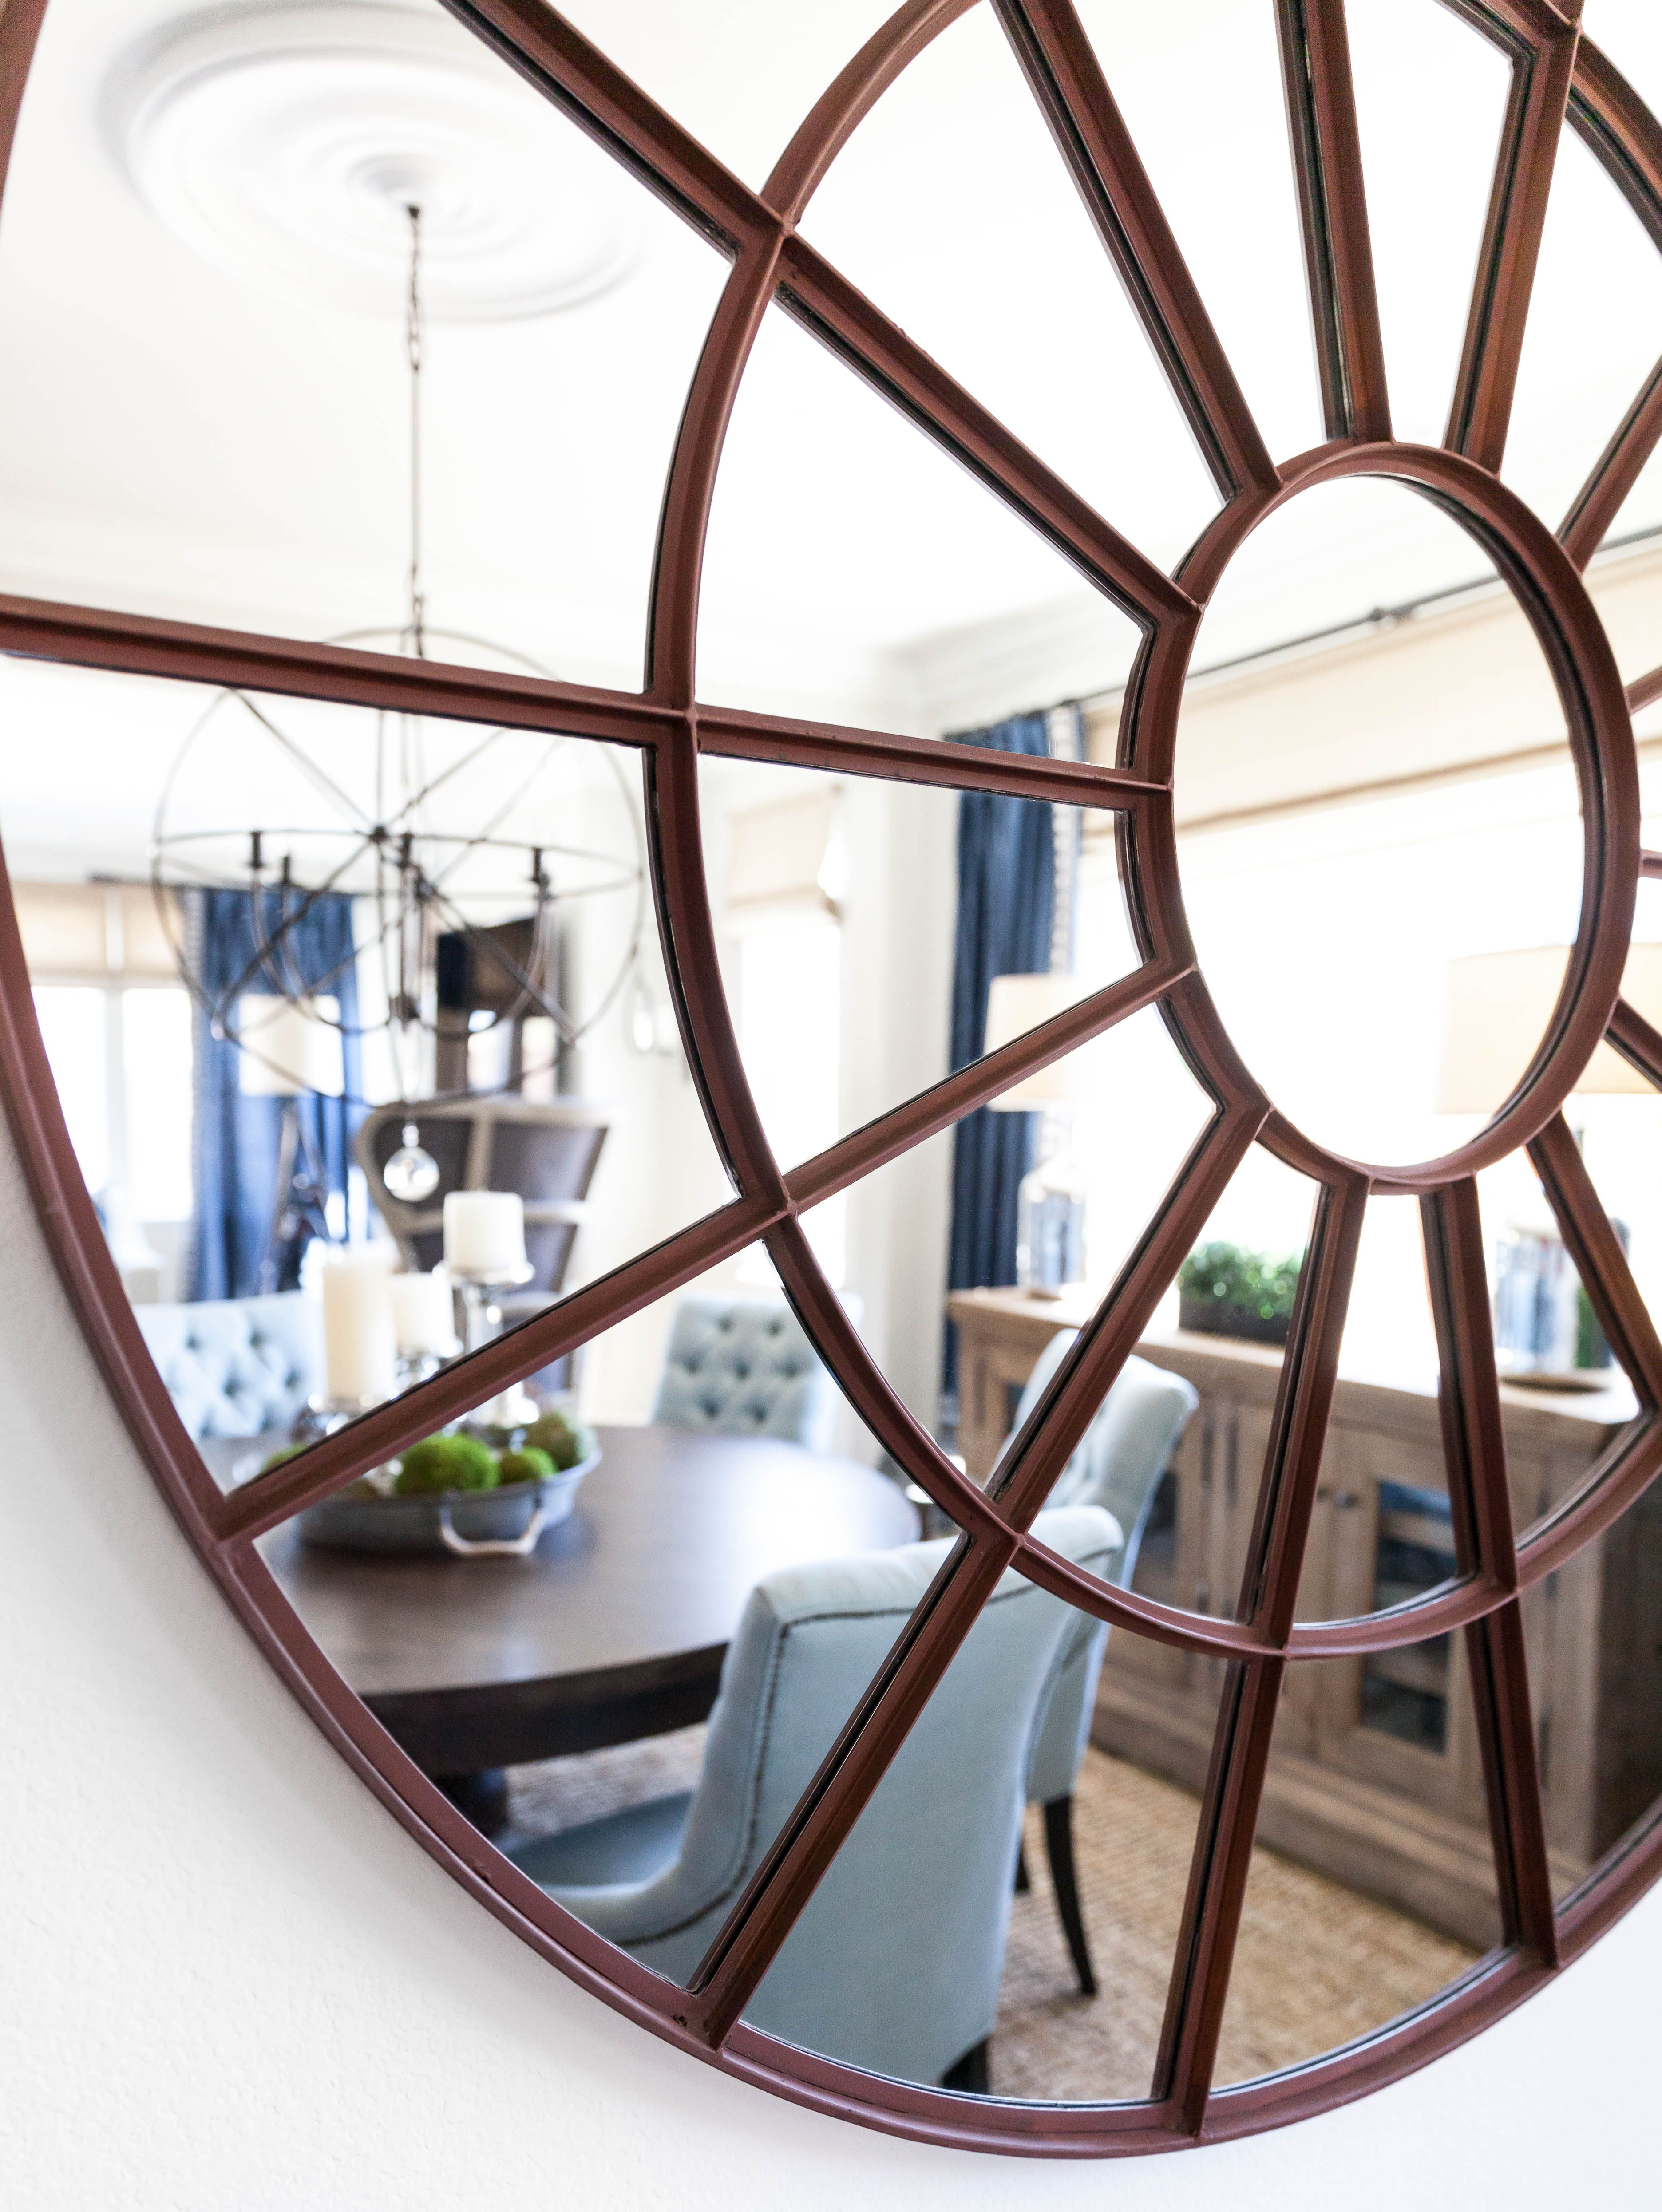 Large Round Mirror 60 Mirror Dining Room Restoration Hardware Mirror Designer Juxtaposed Interiors Mirror Dining Room Interior Dining Room Walls